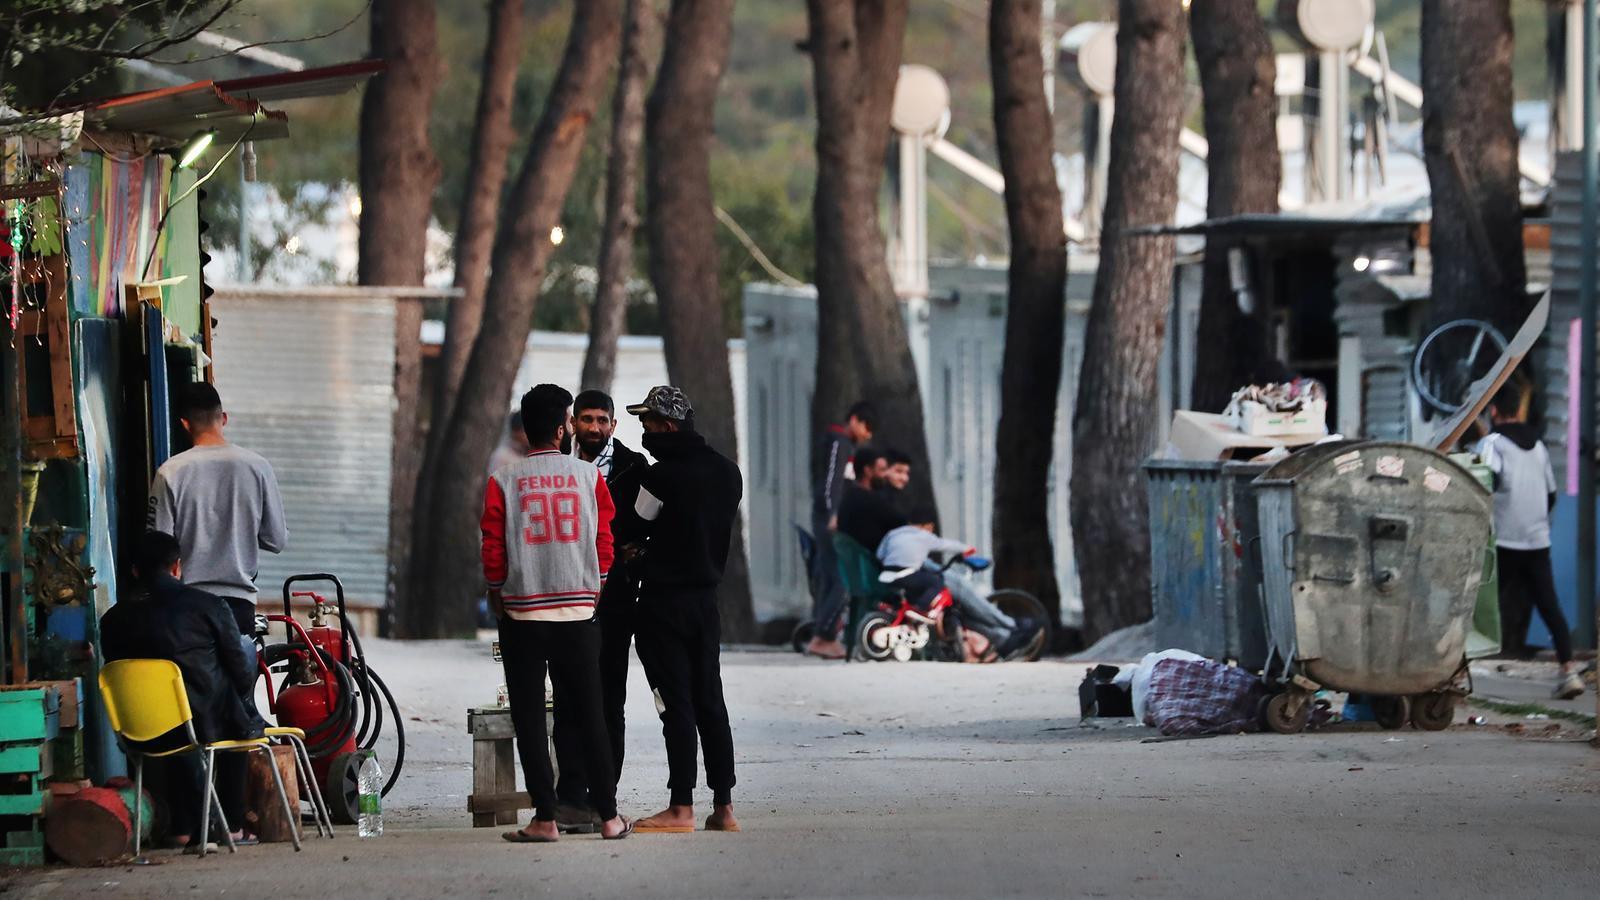 Camp de refugiats de Ritsona, a Grècia